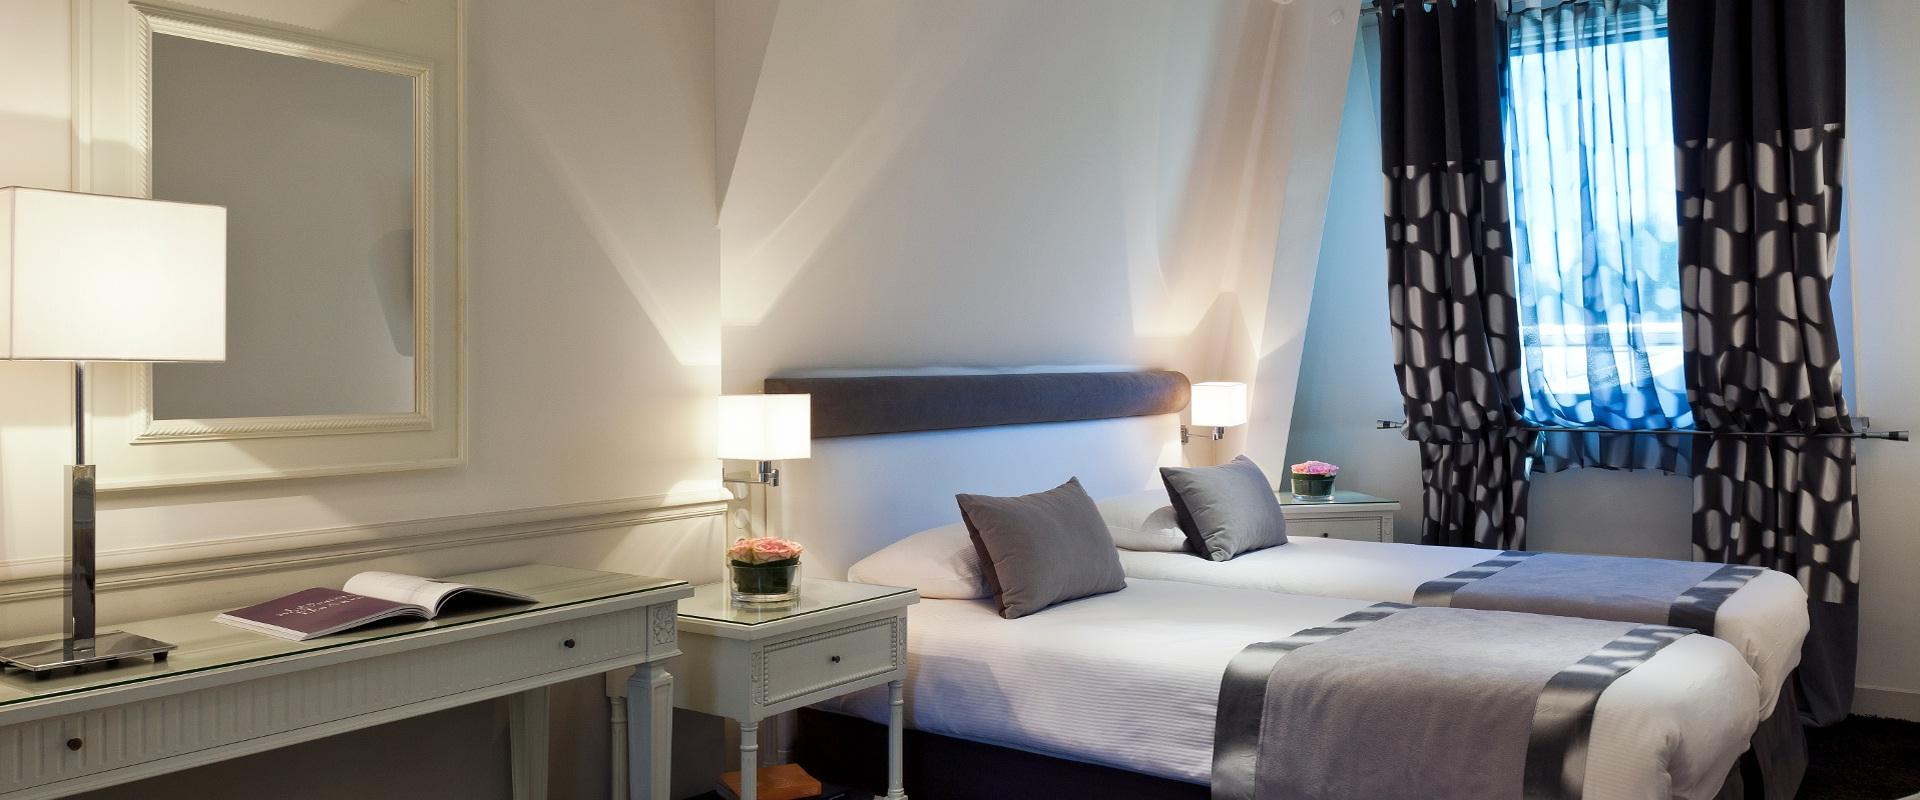 chambre_standard_chateau_bandeau-interne